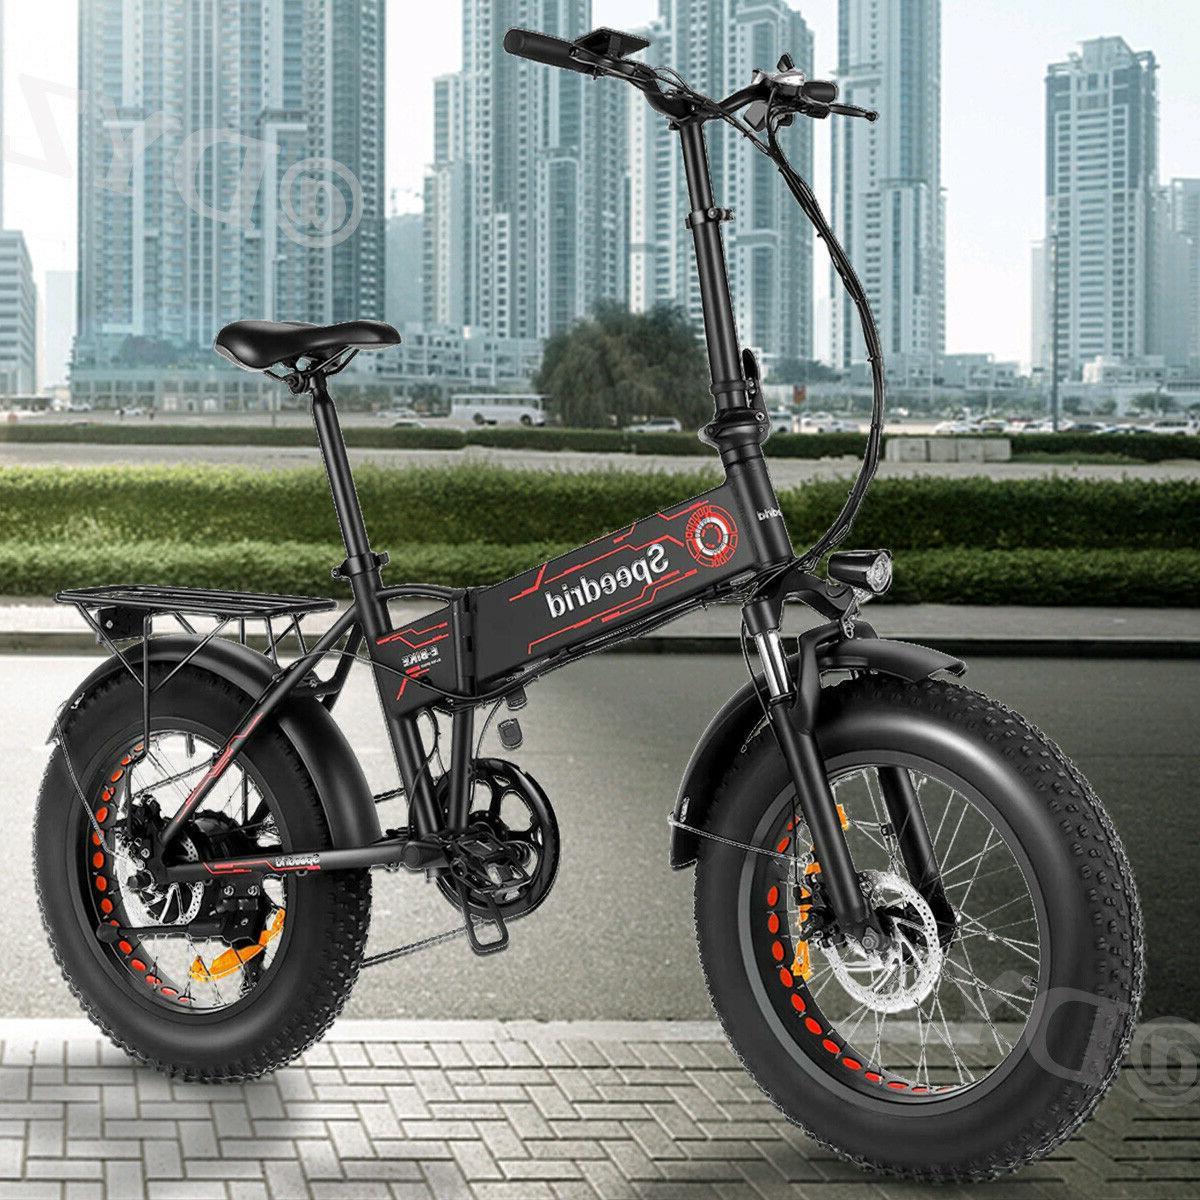 20INCH 500W Bike Folding Fat Tire Mountain 12Ah Battery